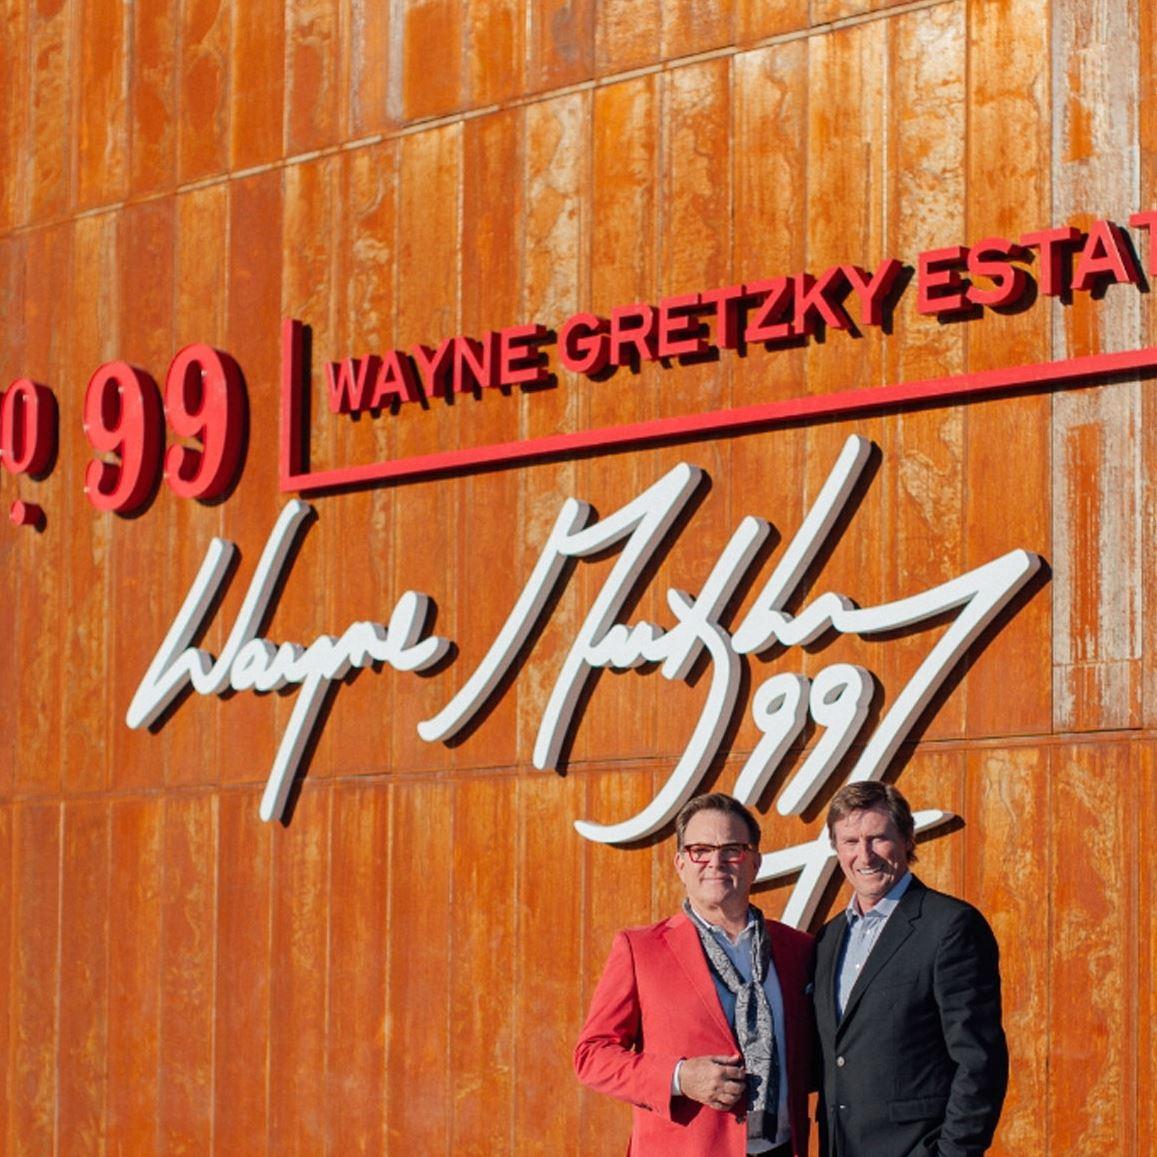 wayne gretzky estates winery John Peller, CEO, Andrew Peller Ltd and Wayne Gretzky celebrate the Grand Opening of the new Wayne Gretzky Estates Winery & Distillery in Niagara-on-the-lake.